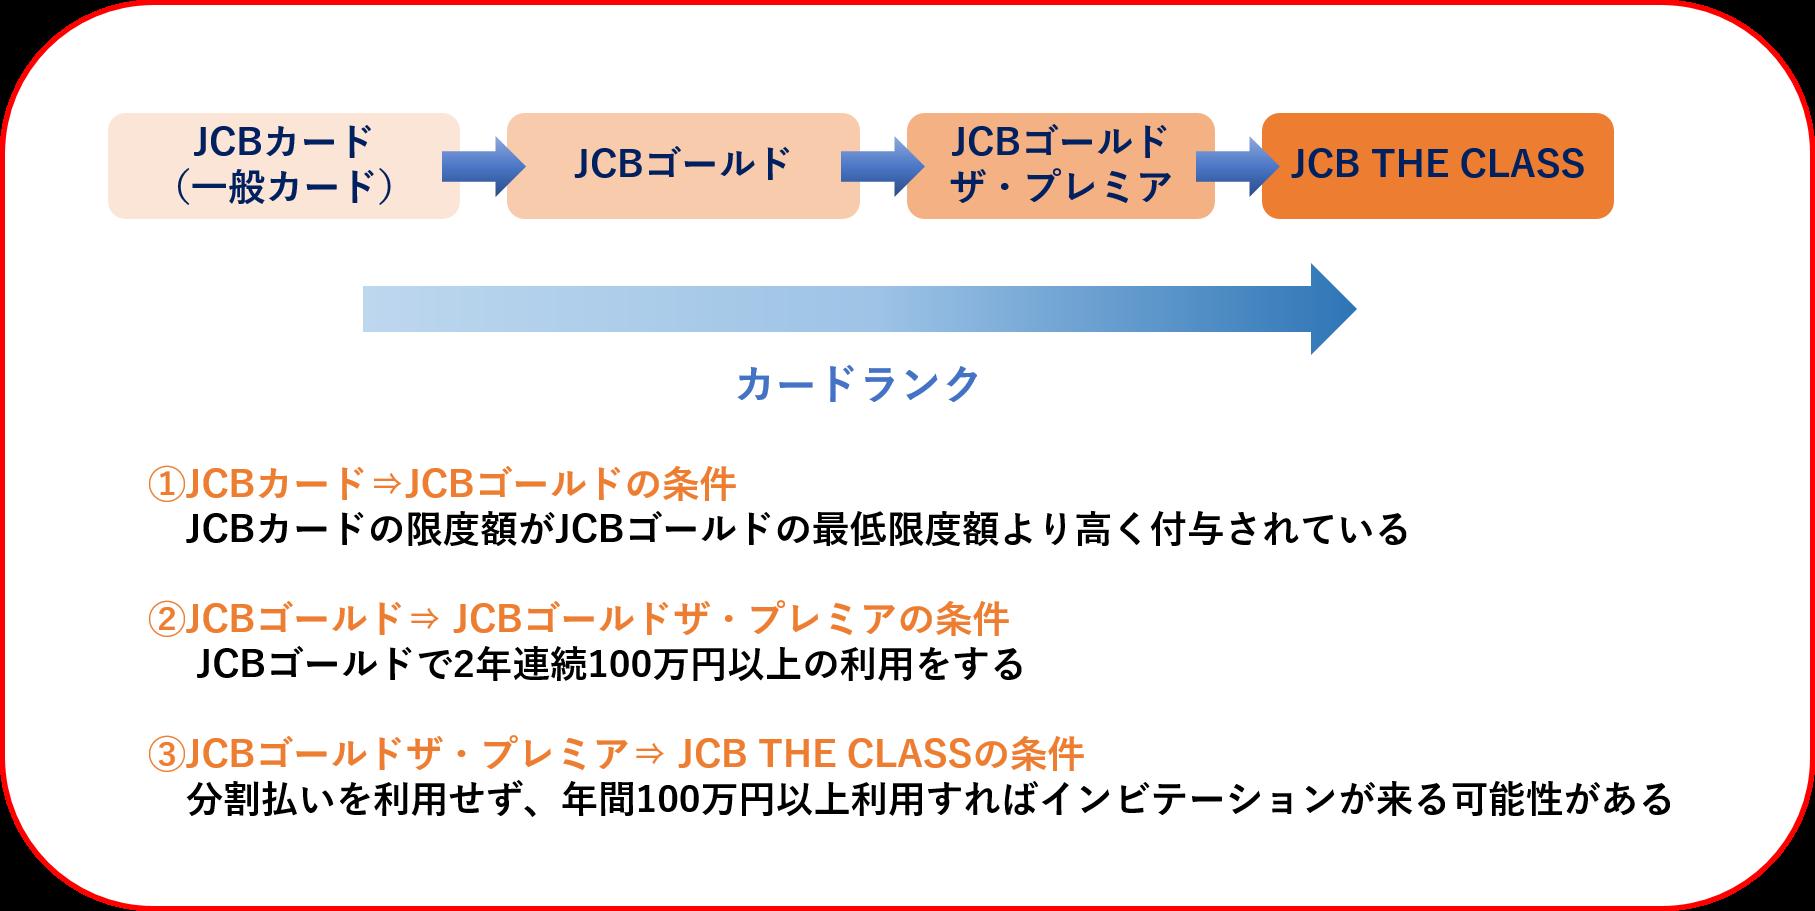 JCB THE CLASS 取得方法15